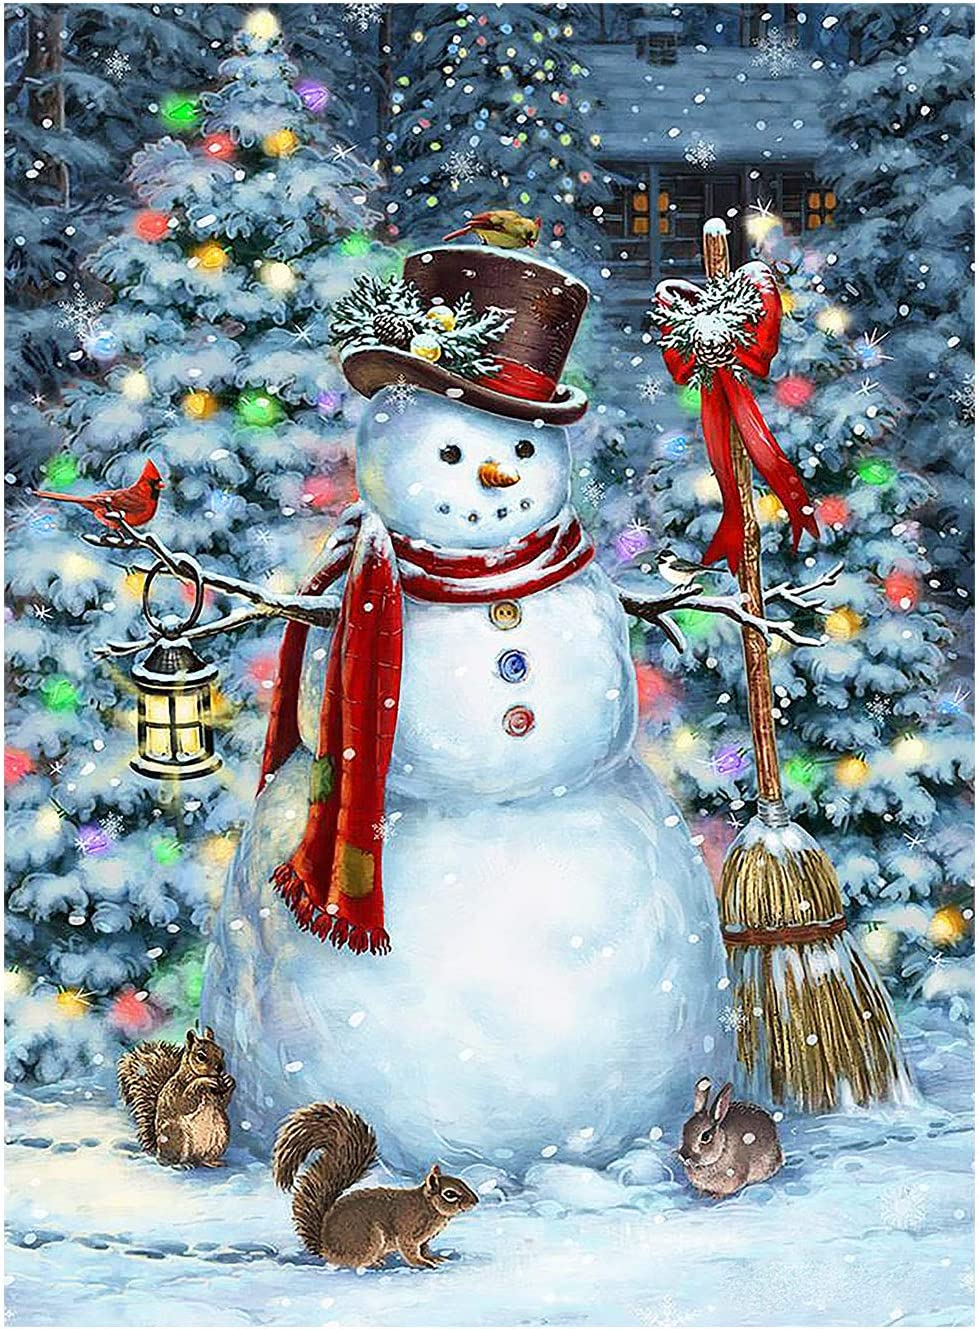 Winter Snowman Christmas Garden Flag Xmas Max 41% OFF Sale SALE% OFF Double Snow Snowflakes